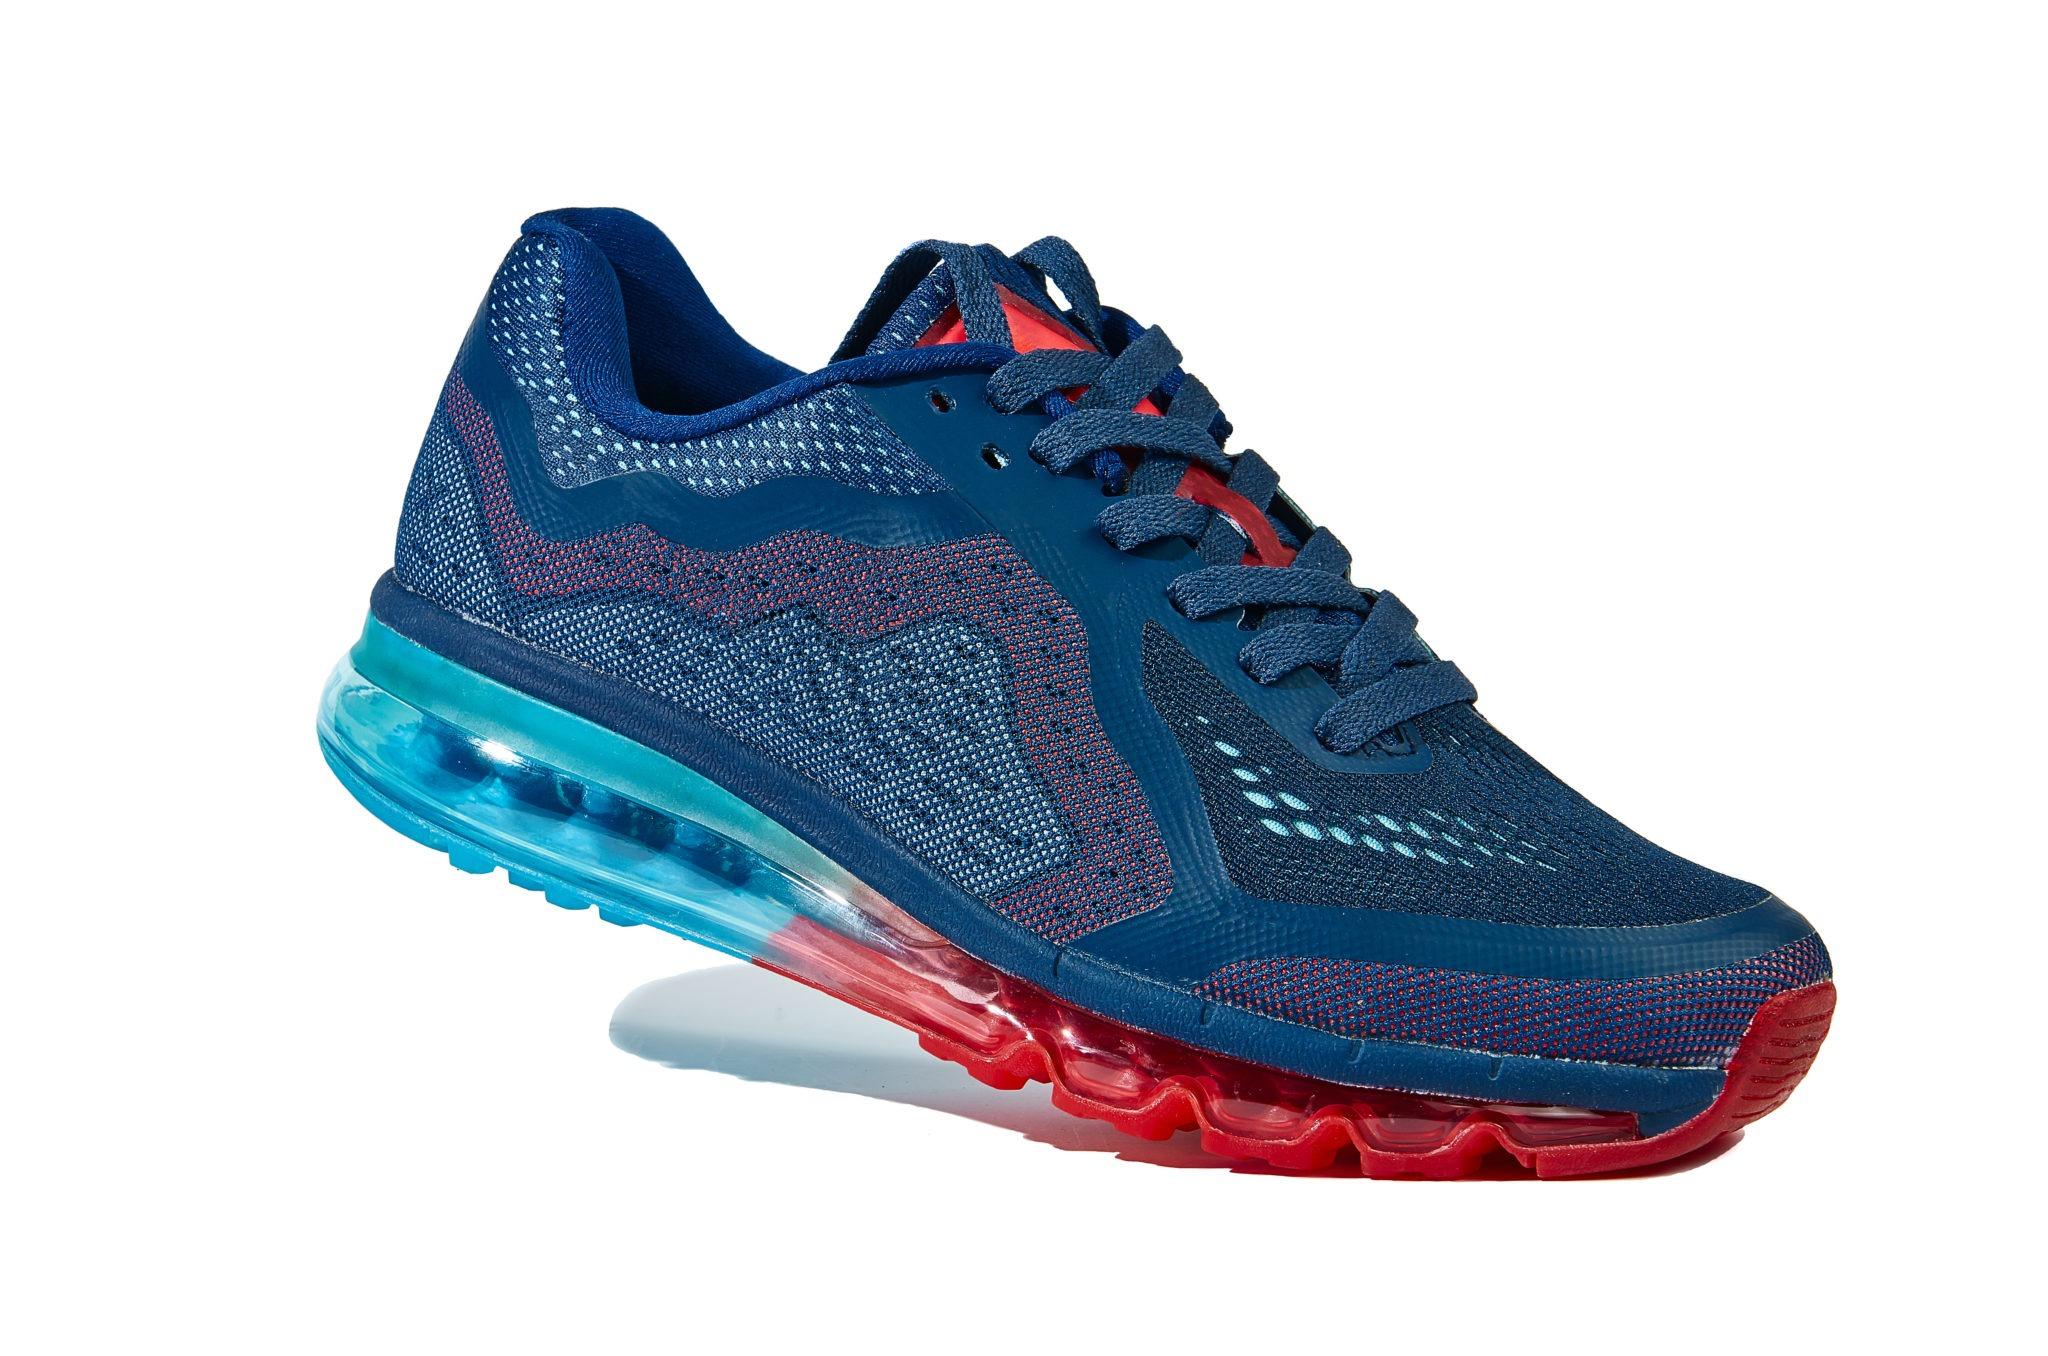 fiesta carga Lidiar con  Cómo se fabrican las zapatillas Nike? Construcción de montado en frío - How  Shoes are Made: The Sneaker Factory